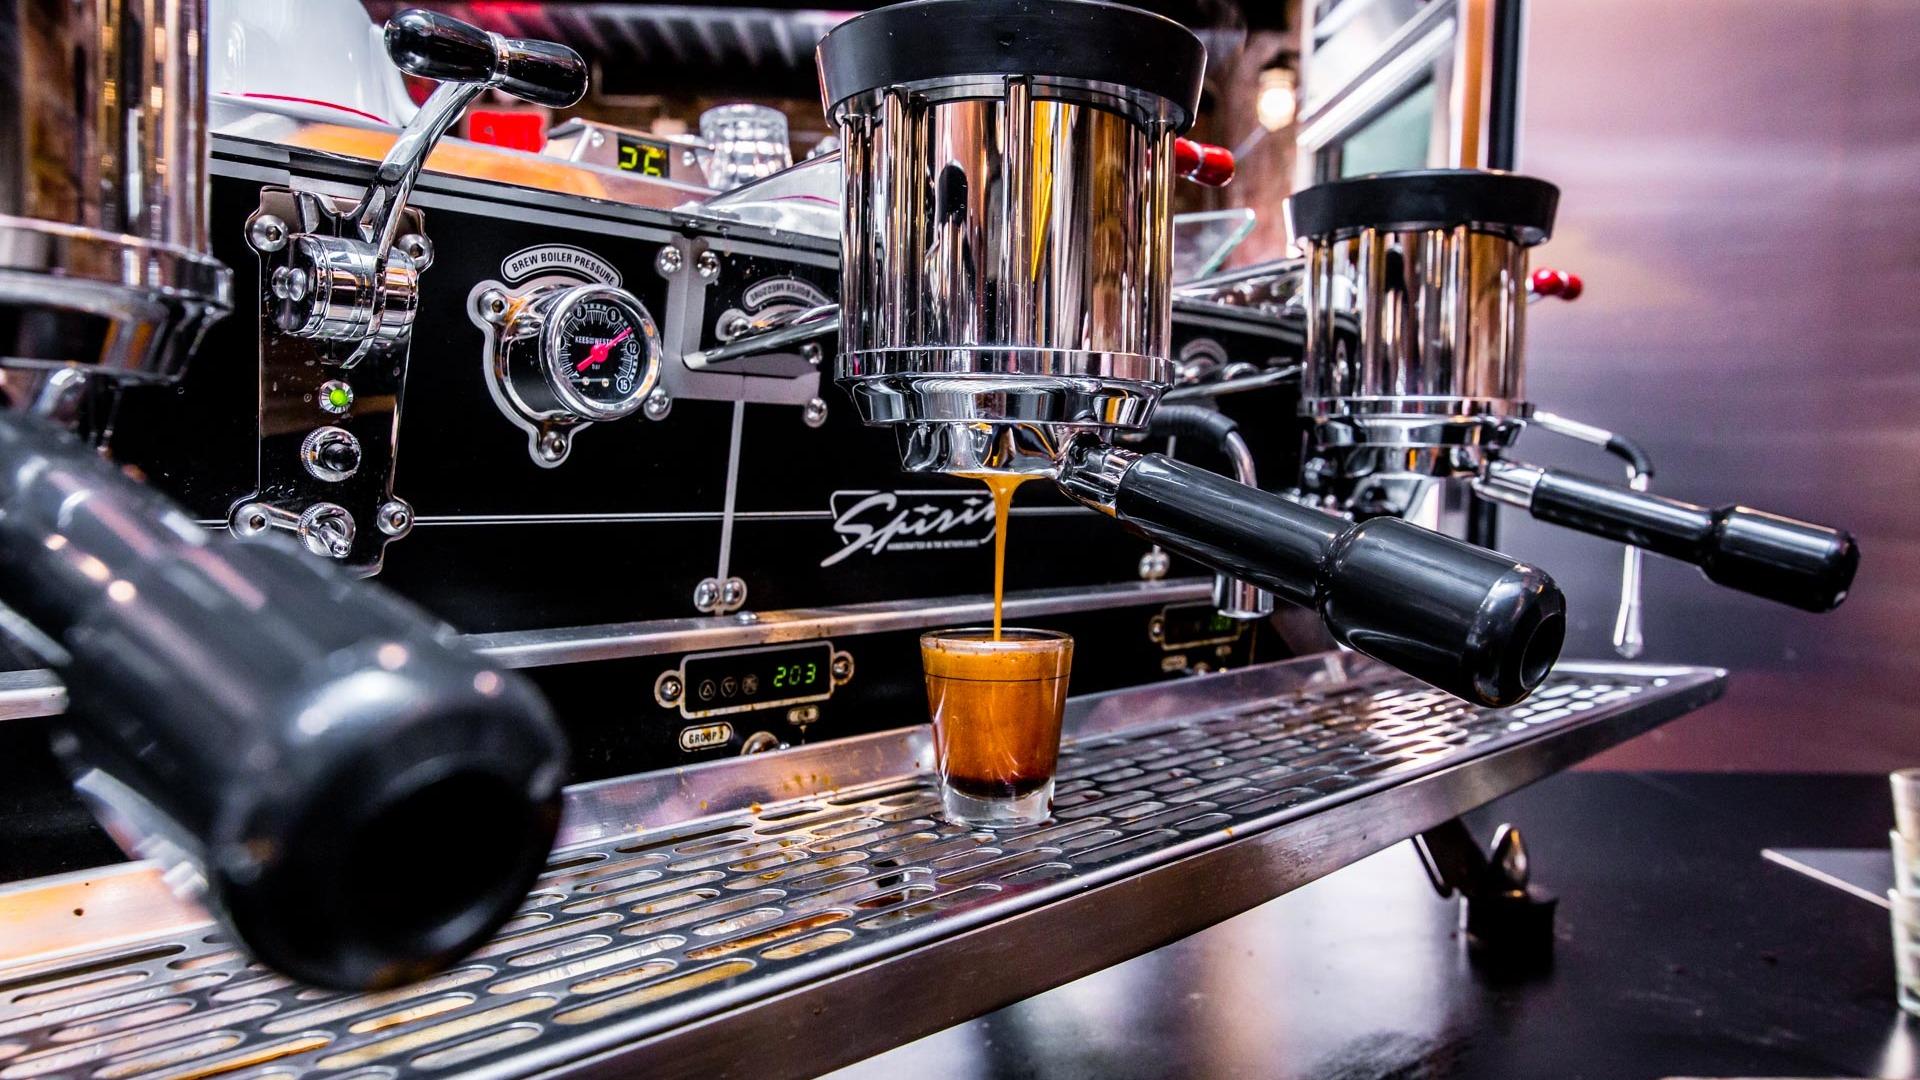 caffe_vita_coffee_roasting_company-20